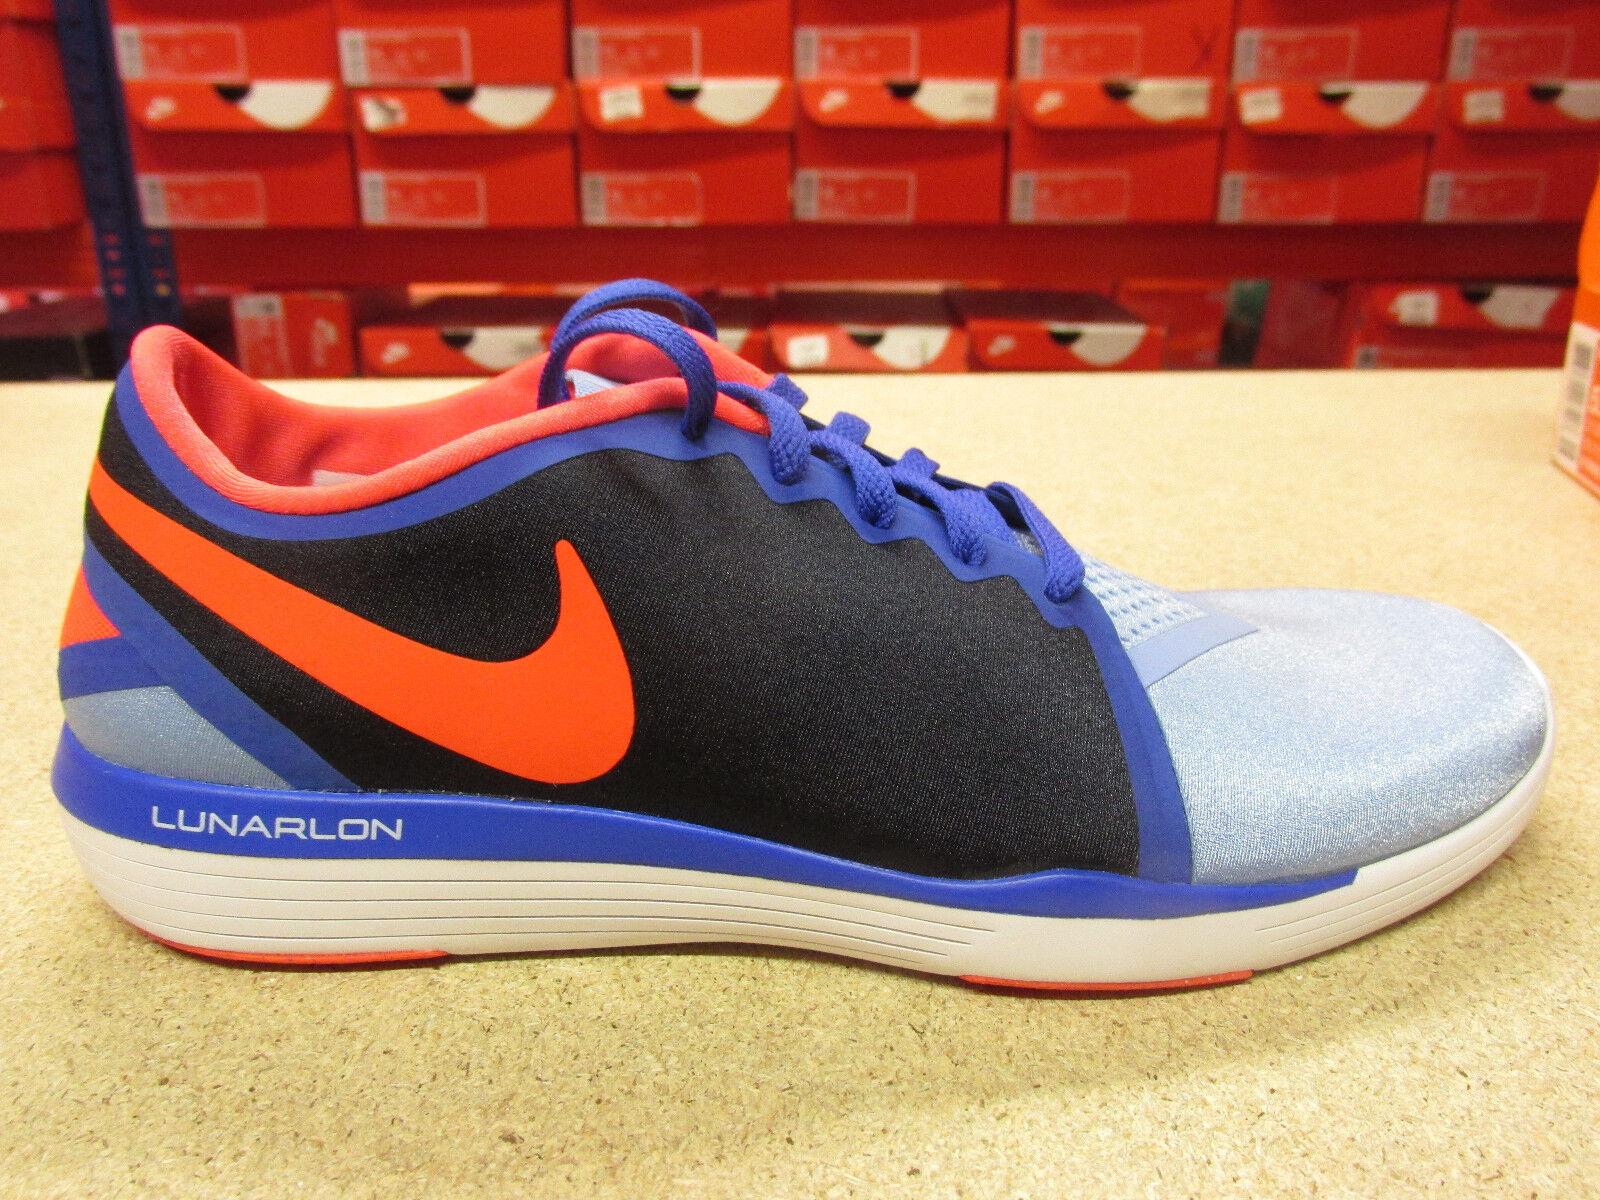 Nike Damenschuhe Lunar Sculpt Sneakers Running Trainers 818062 400 Sneakers Sculpt Schuhes bc176c